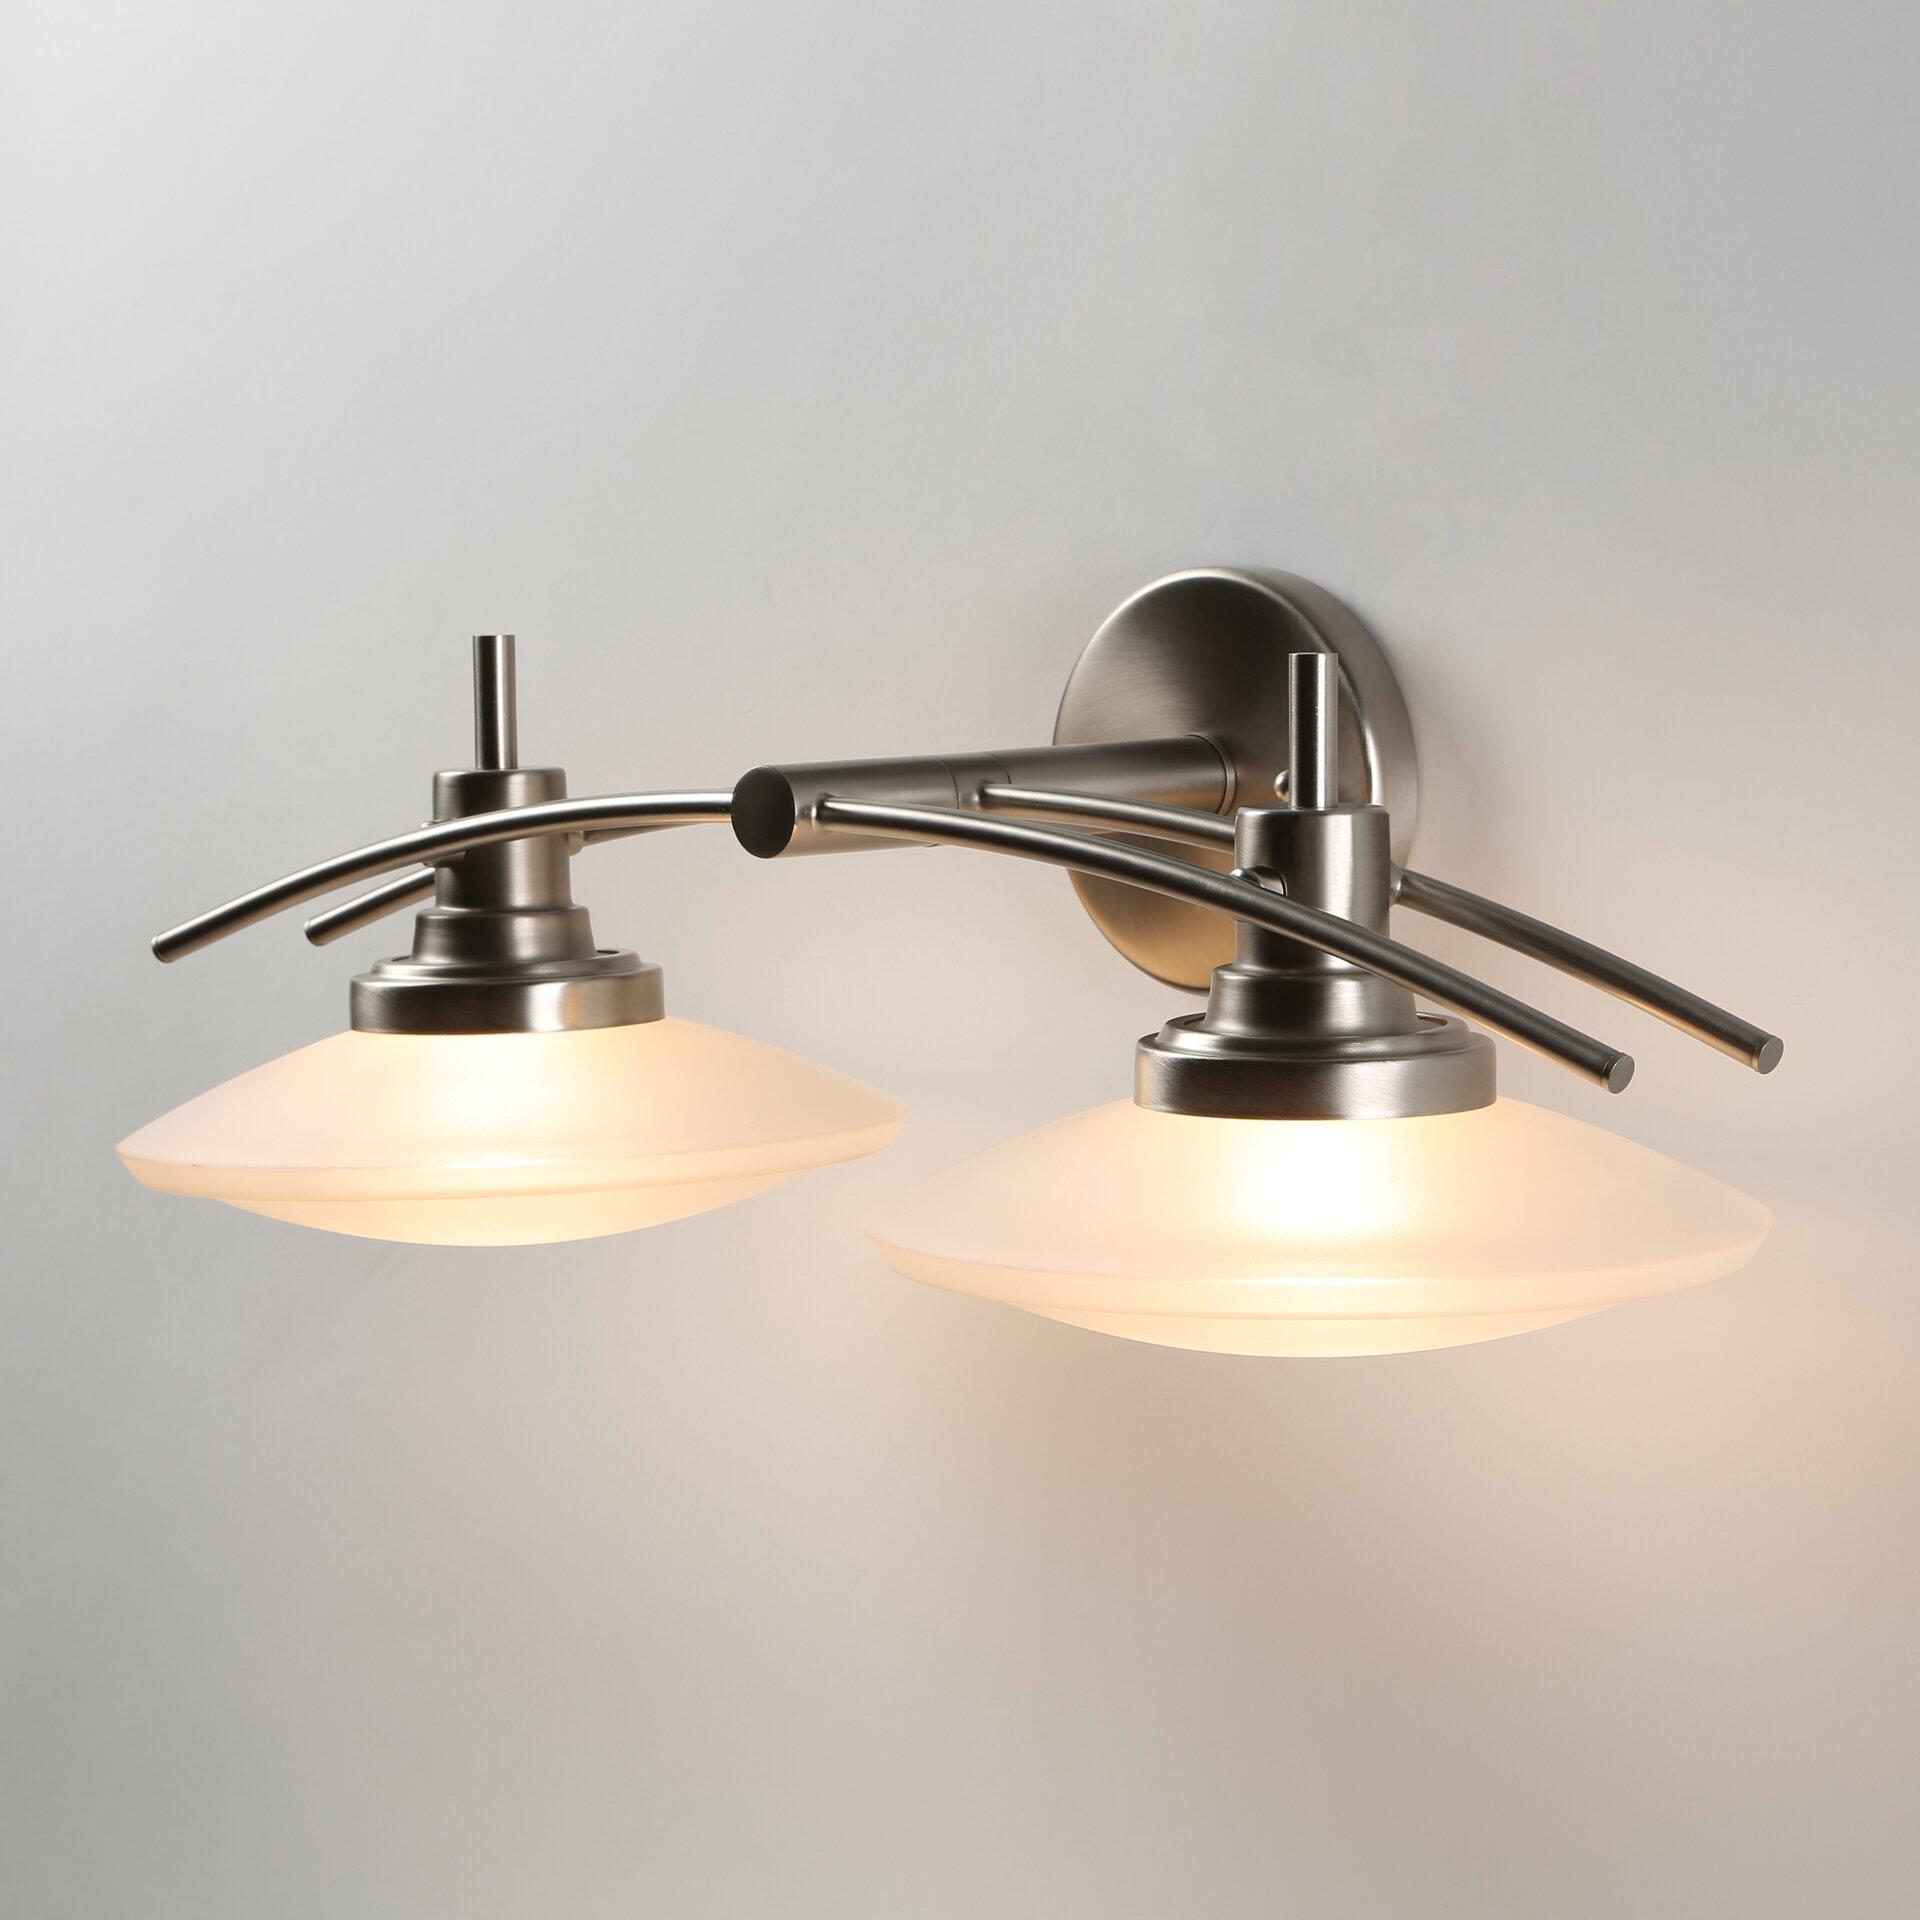 Kichler Landscape Lighting Reviews : Kichler lighting reviews structures light